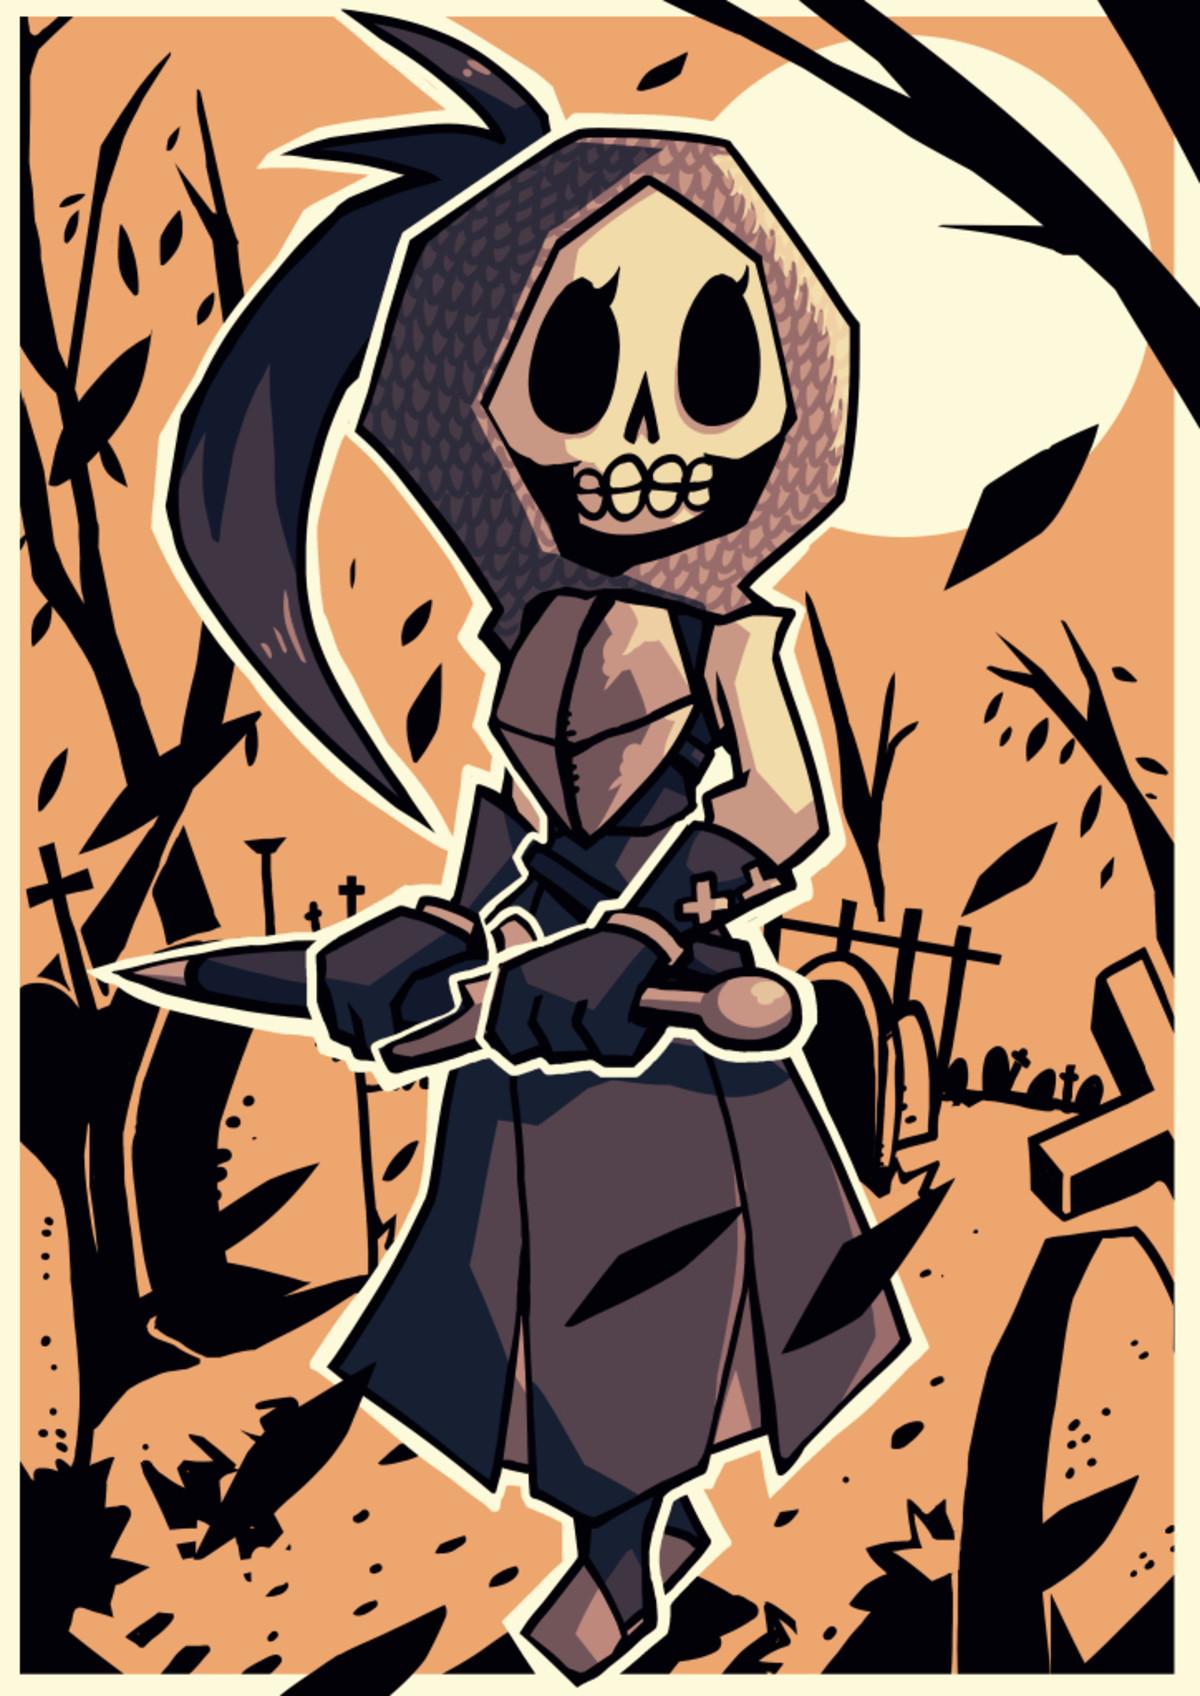 No Skeleton Graveyard Patrolling Waifu. .. She cute Got big eye sockets